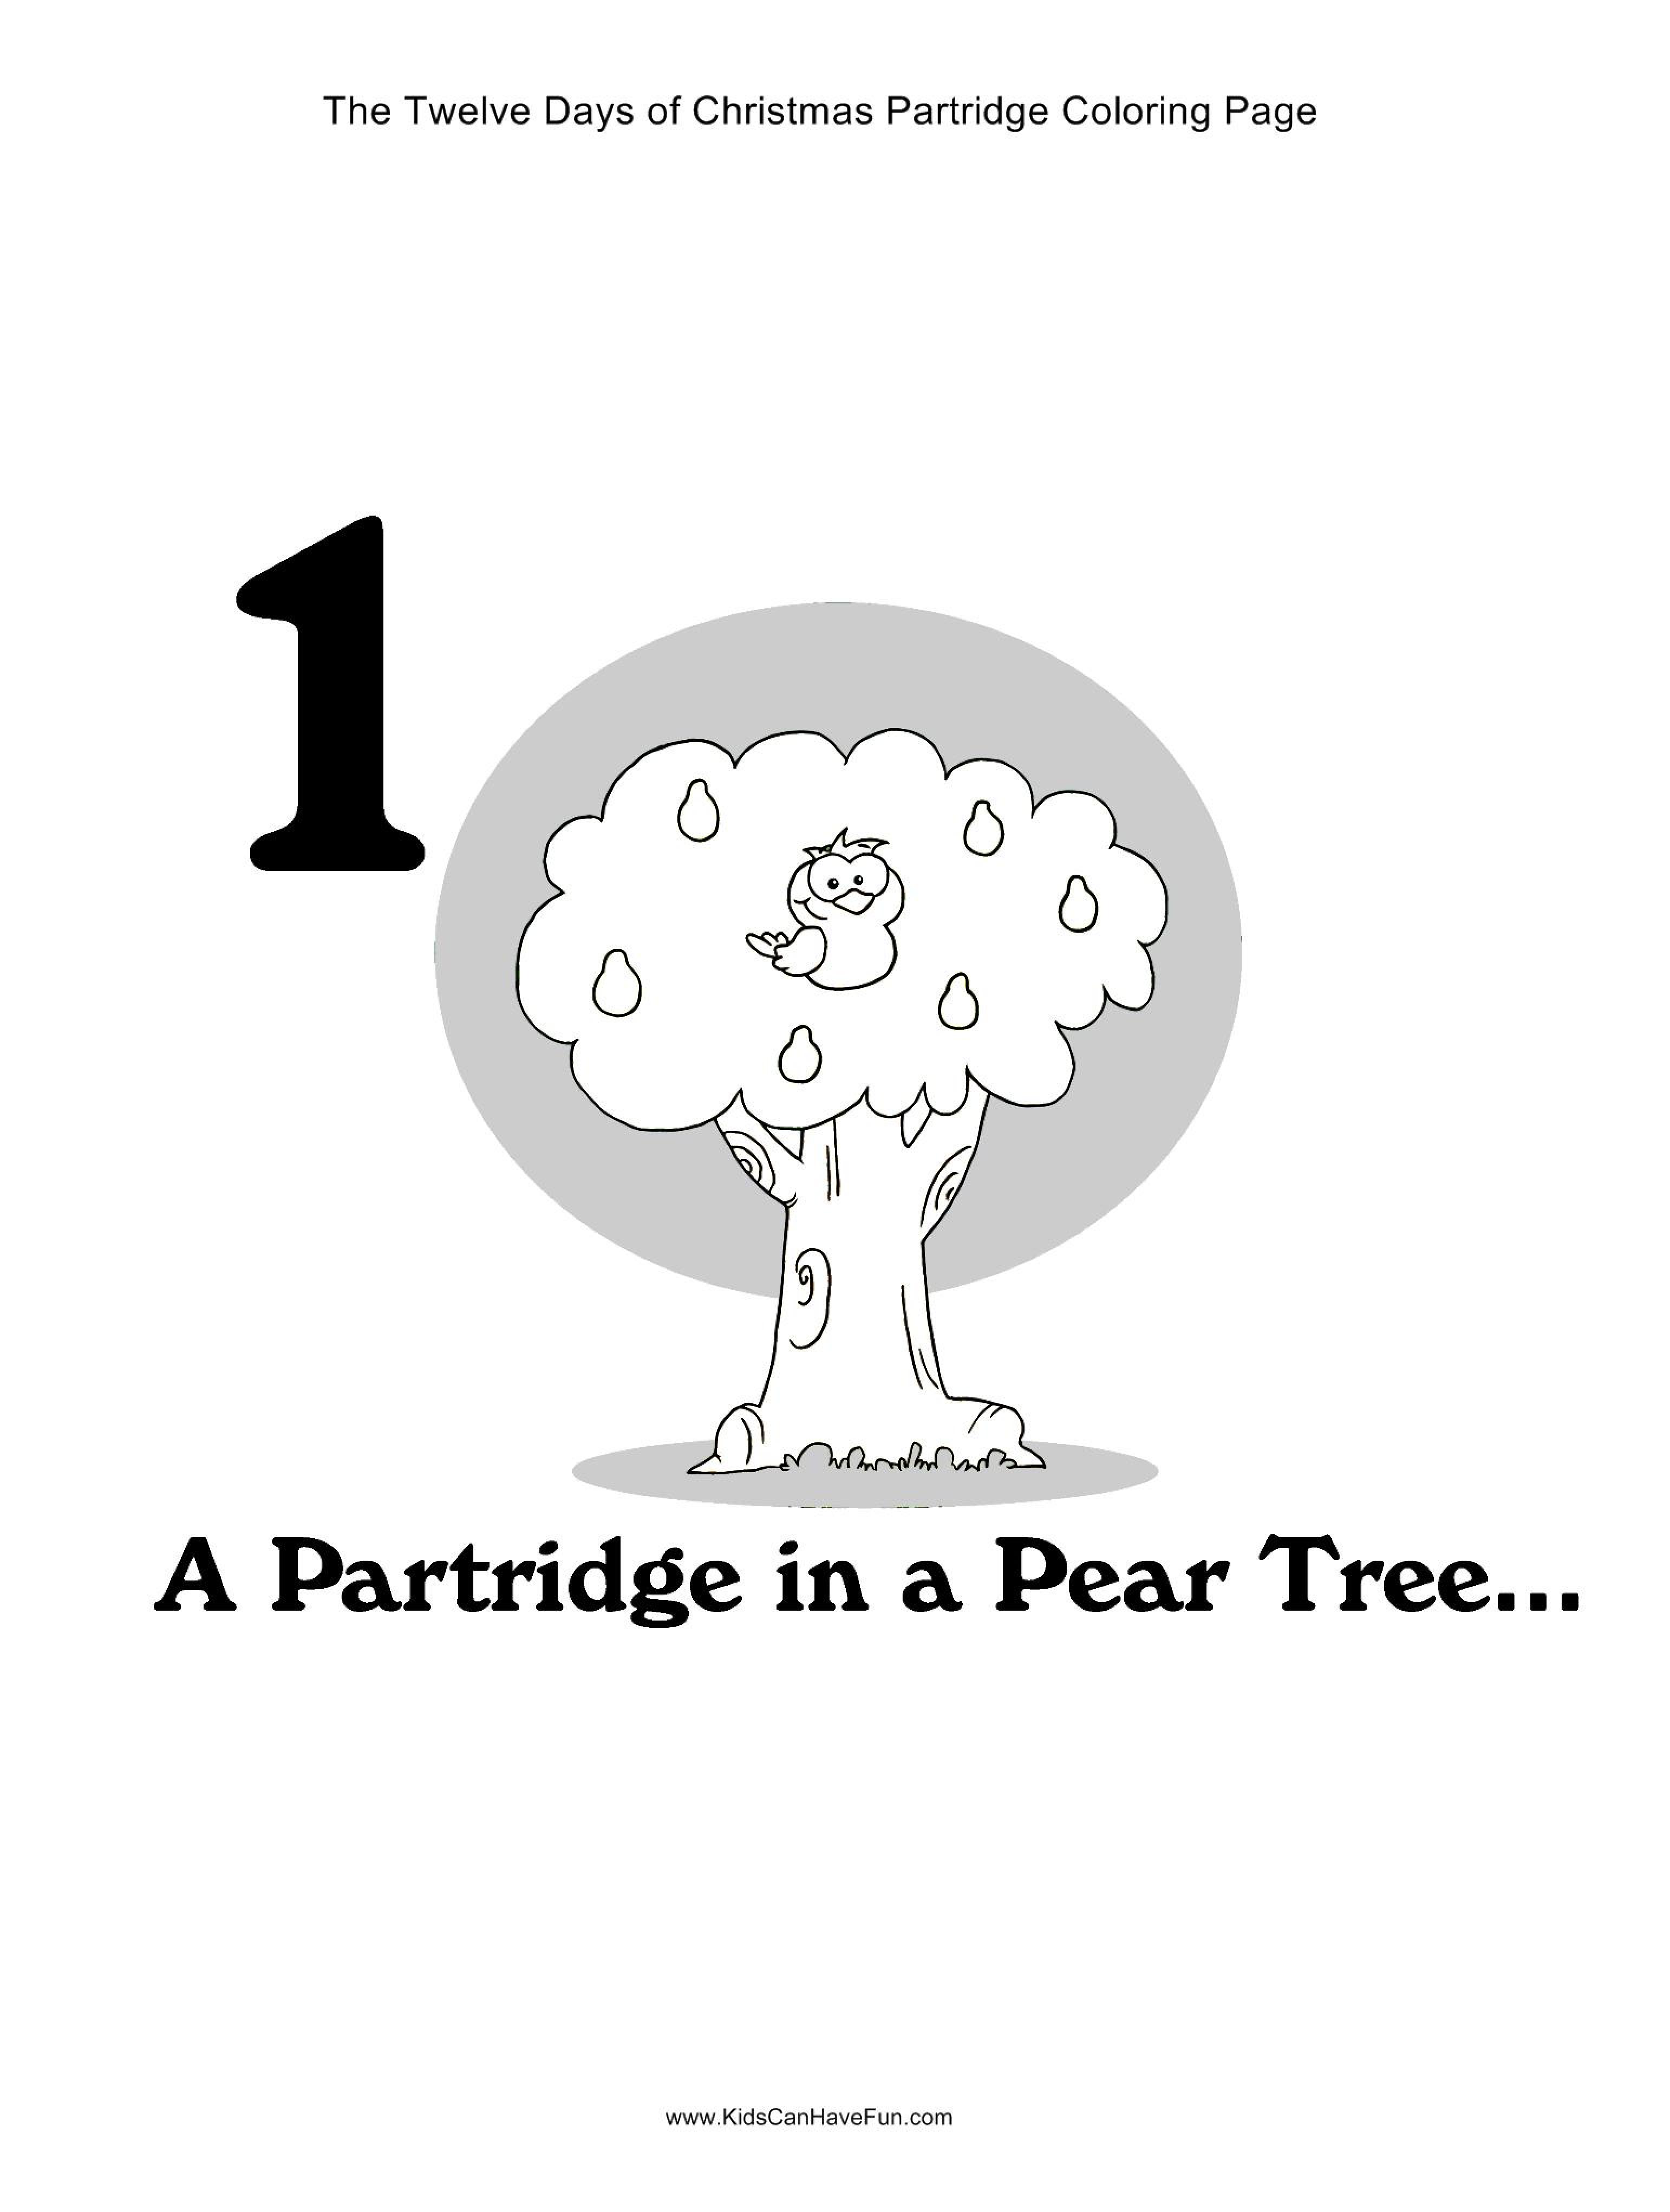 Pin By Kidscanhavefun On Twelve Days Of Christmas